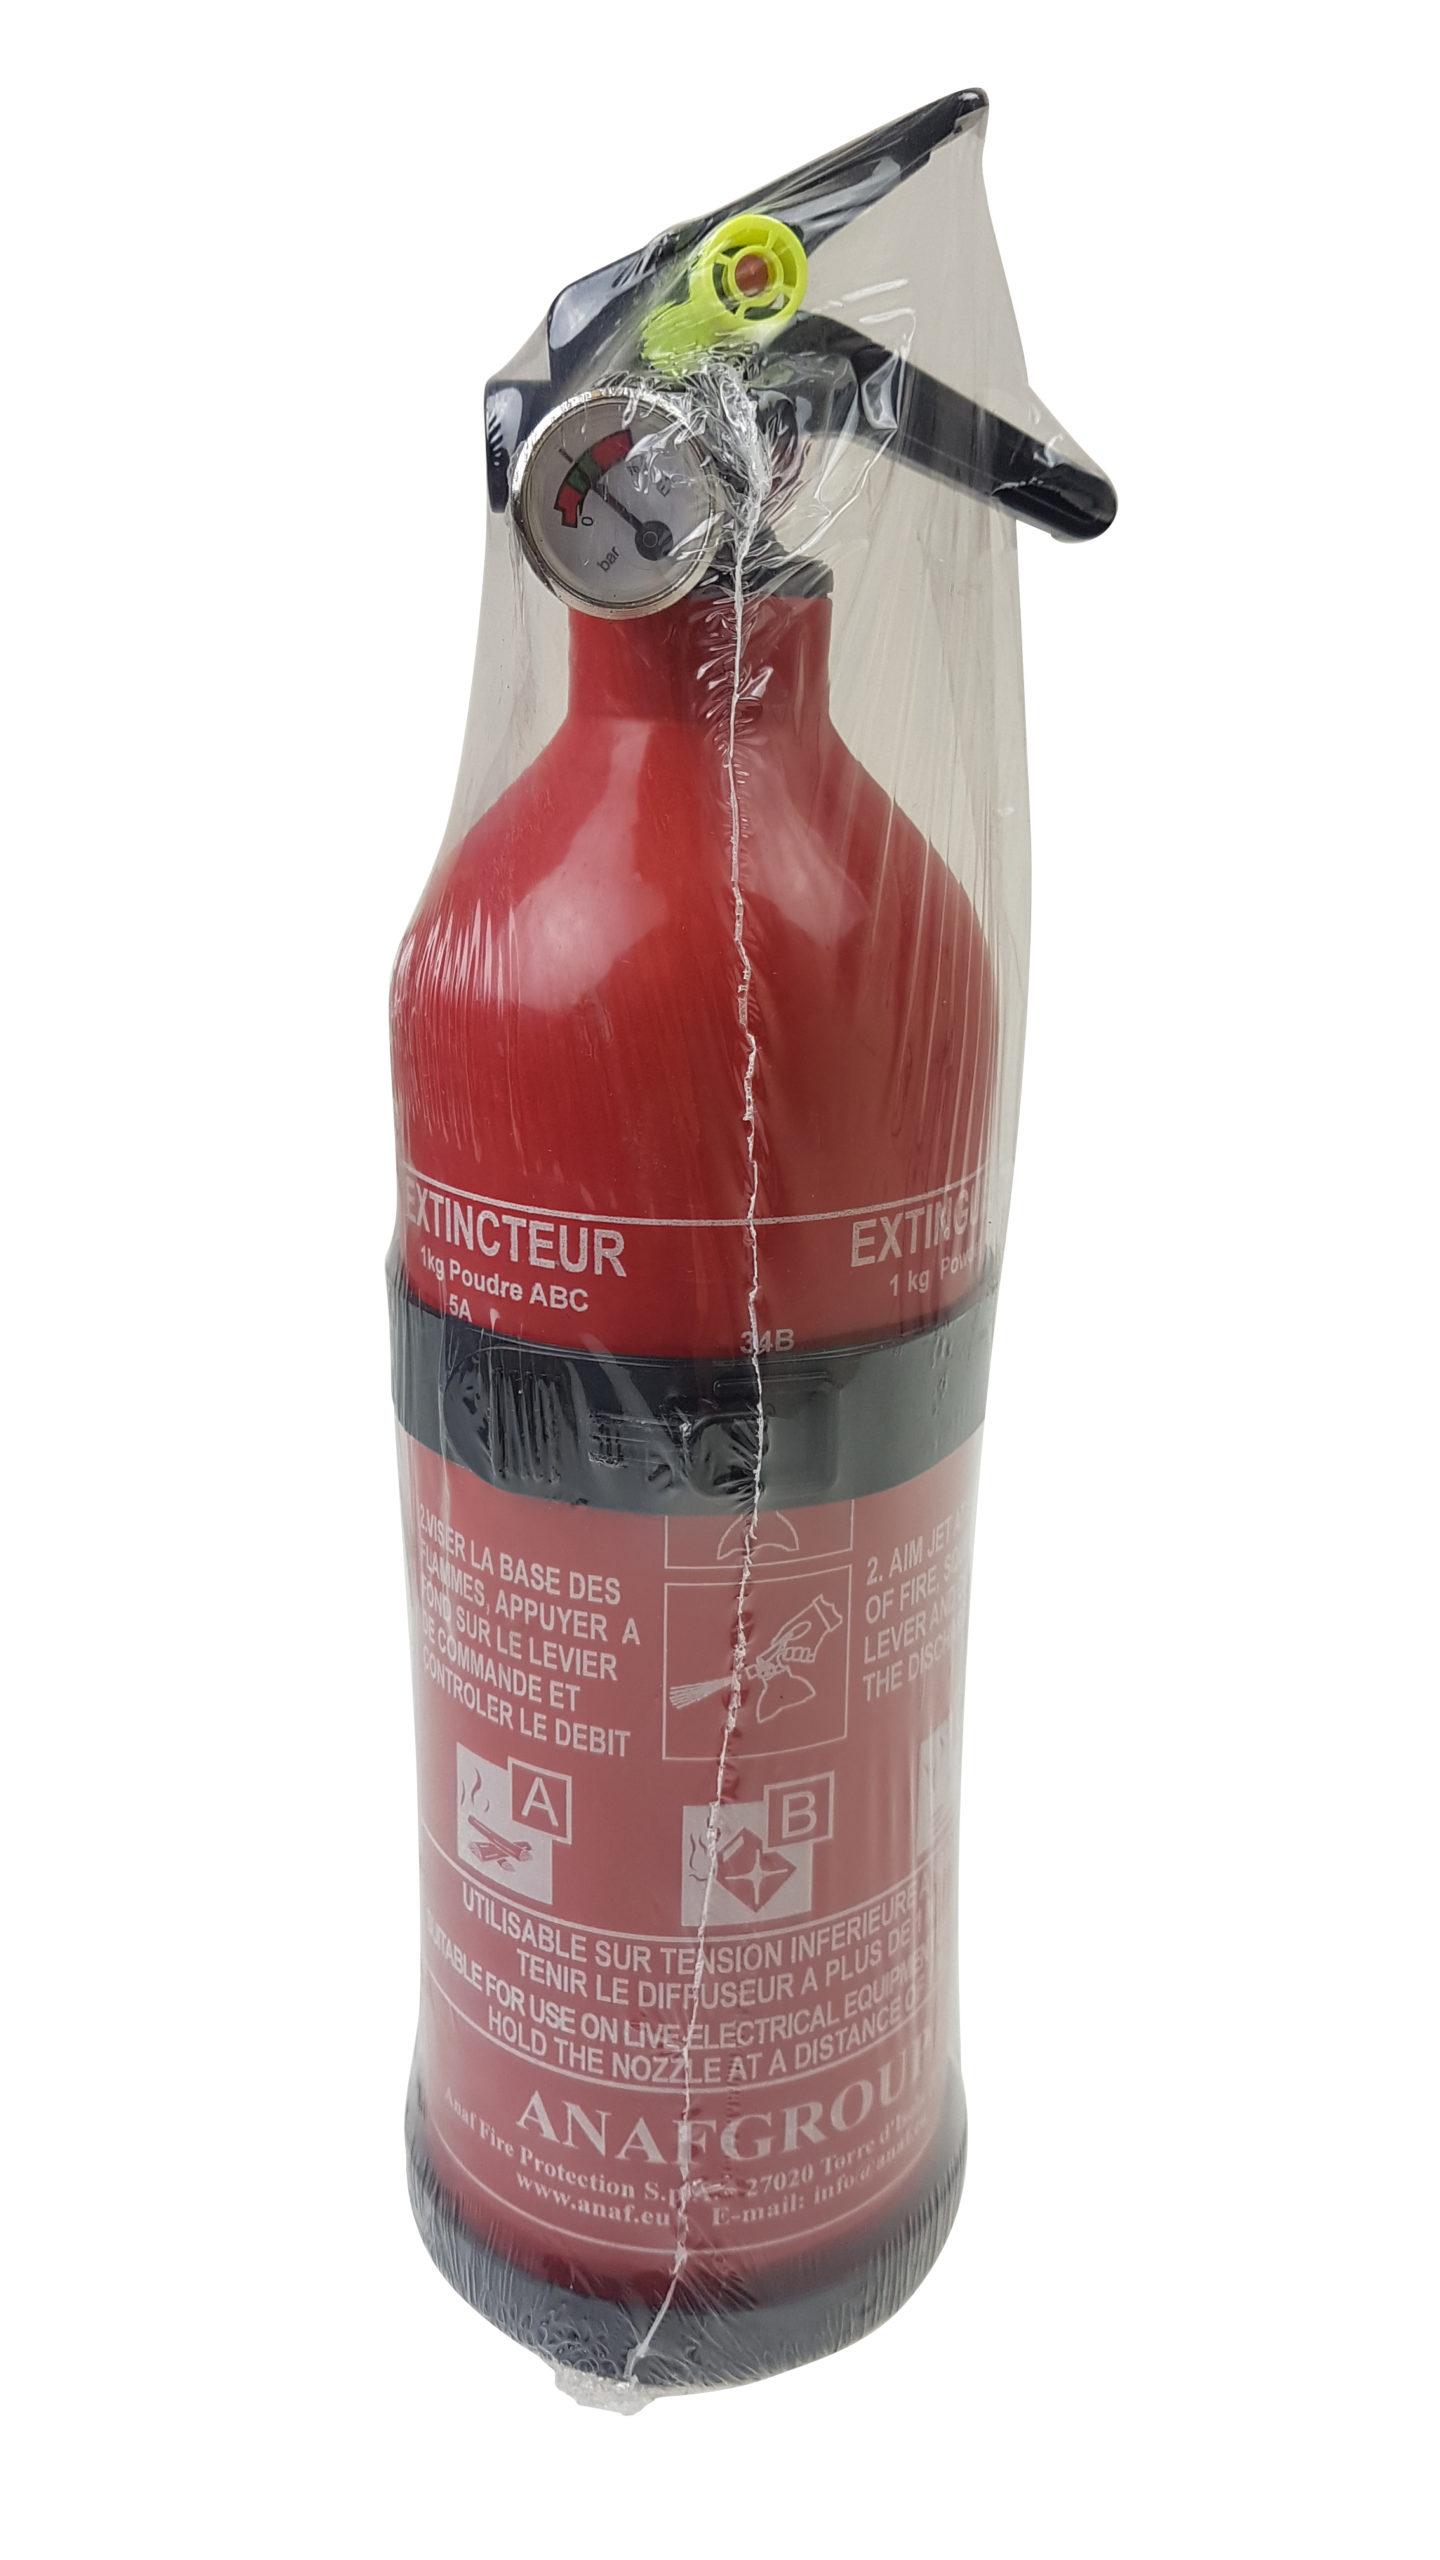 Fire Extinguisher (1KG) - With Pressure Gauge